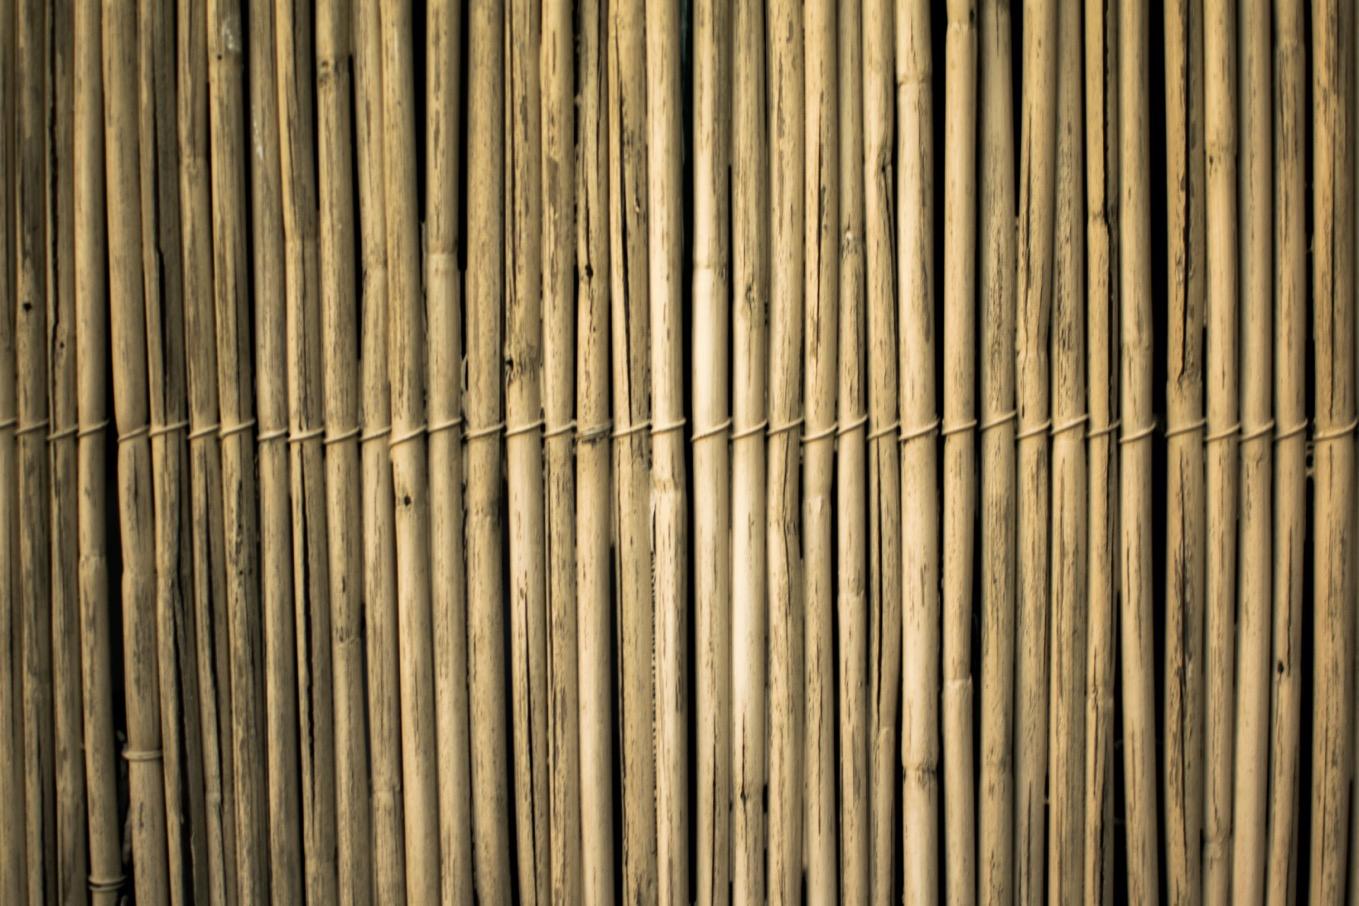 Brown bamboos 2463358